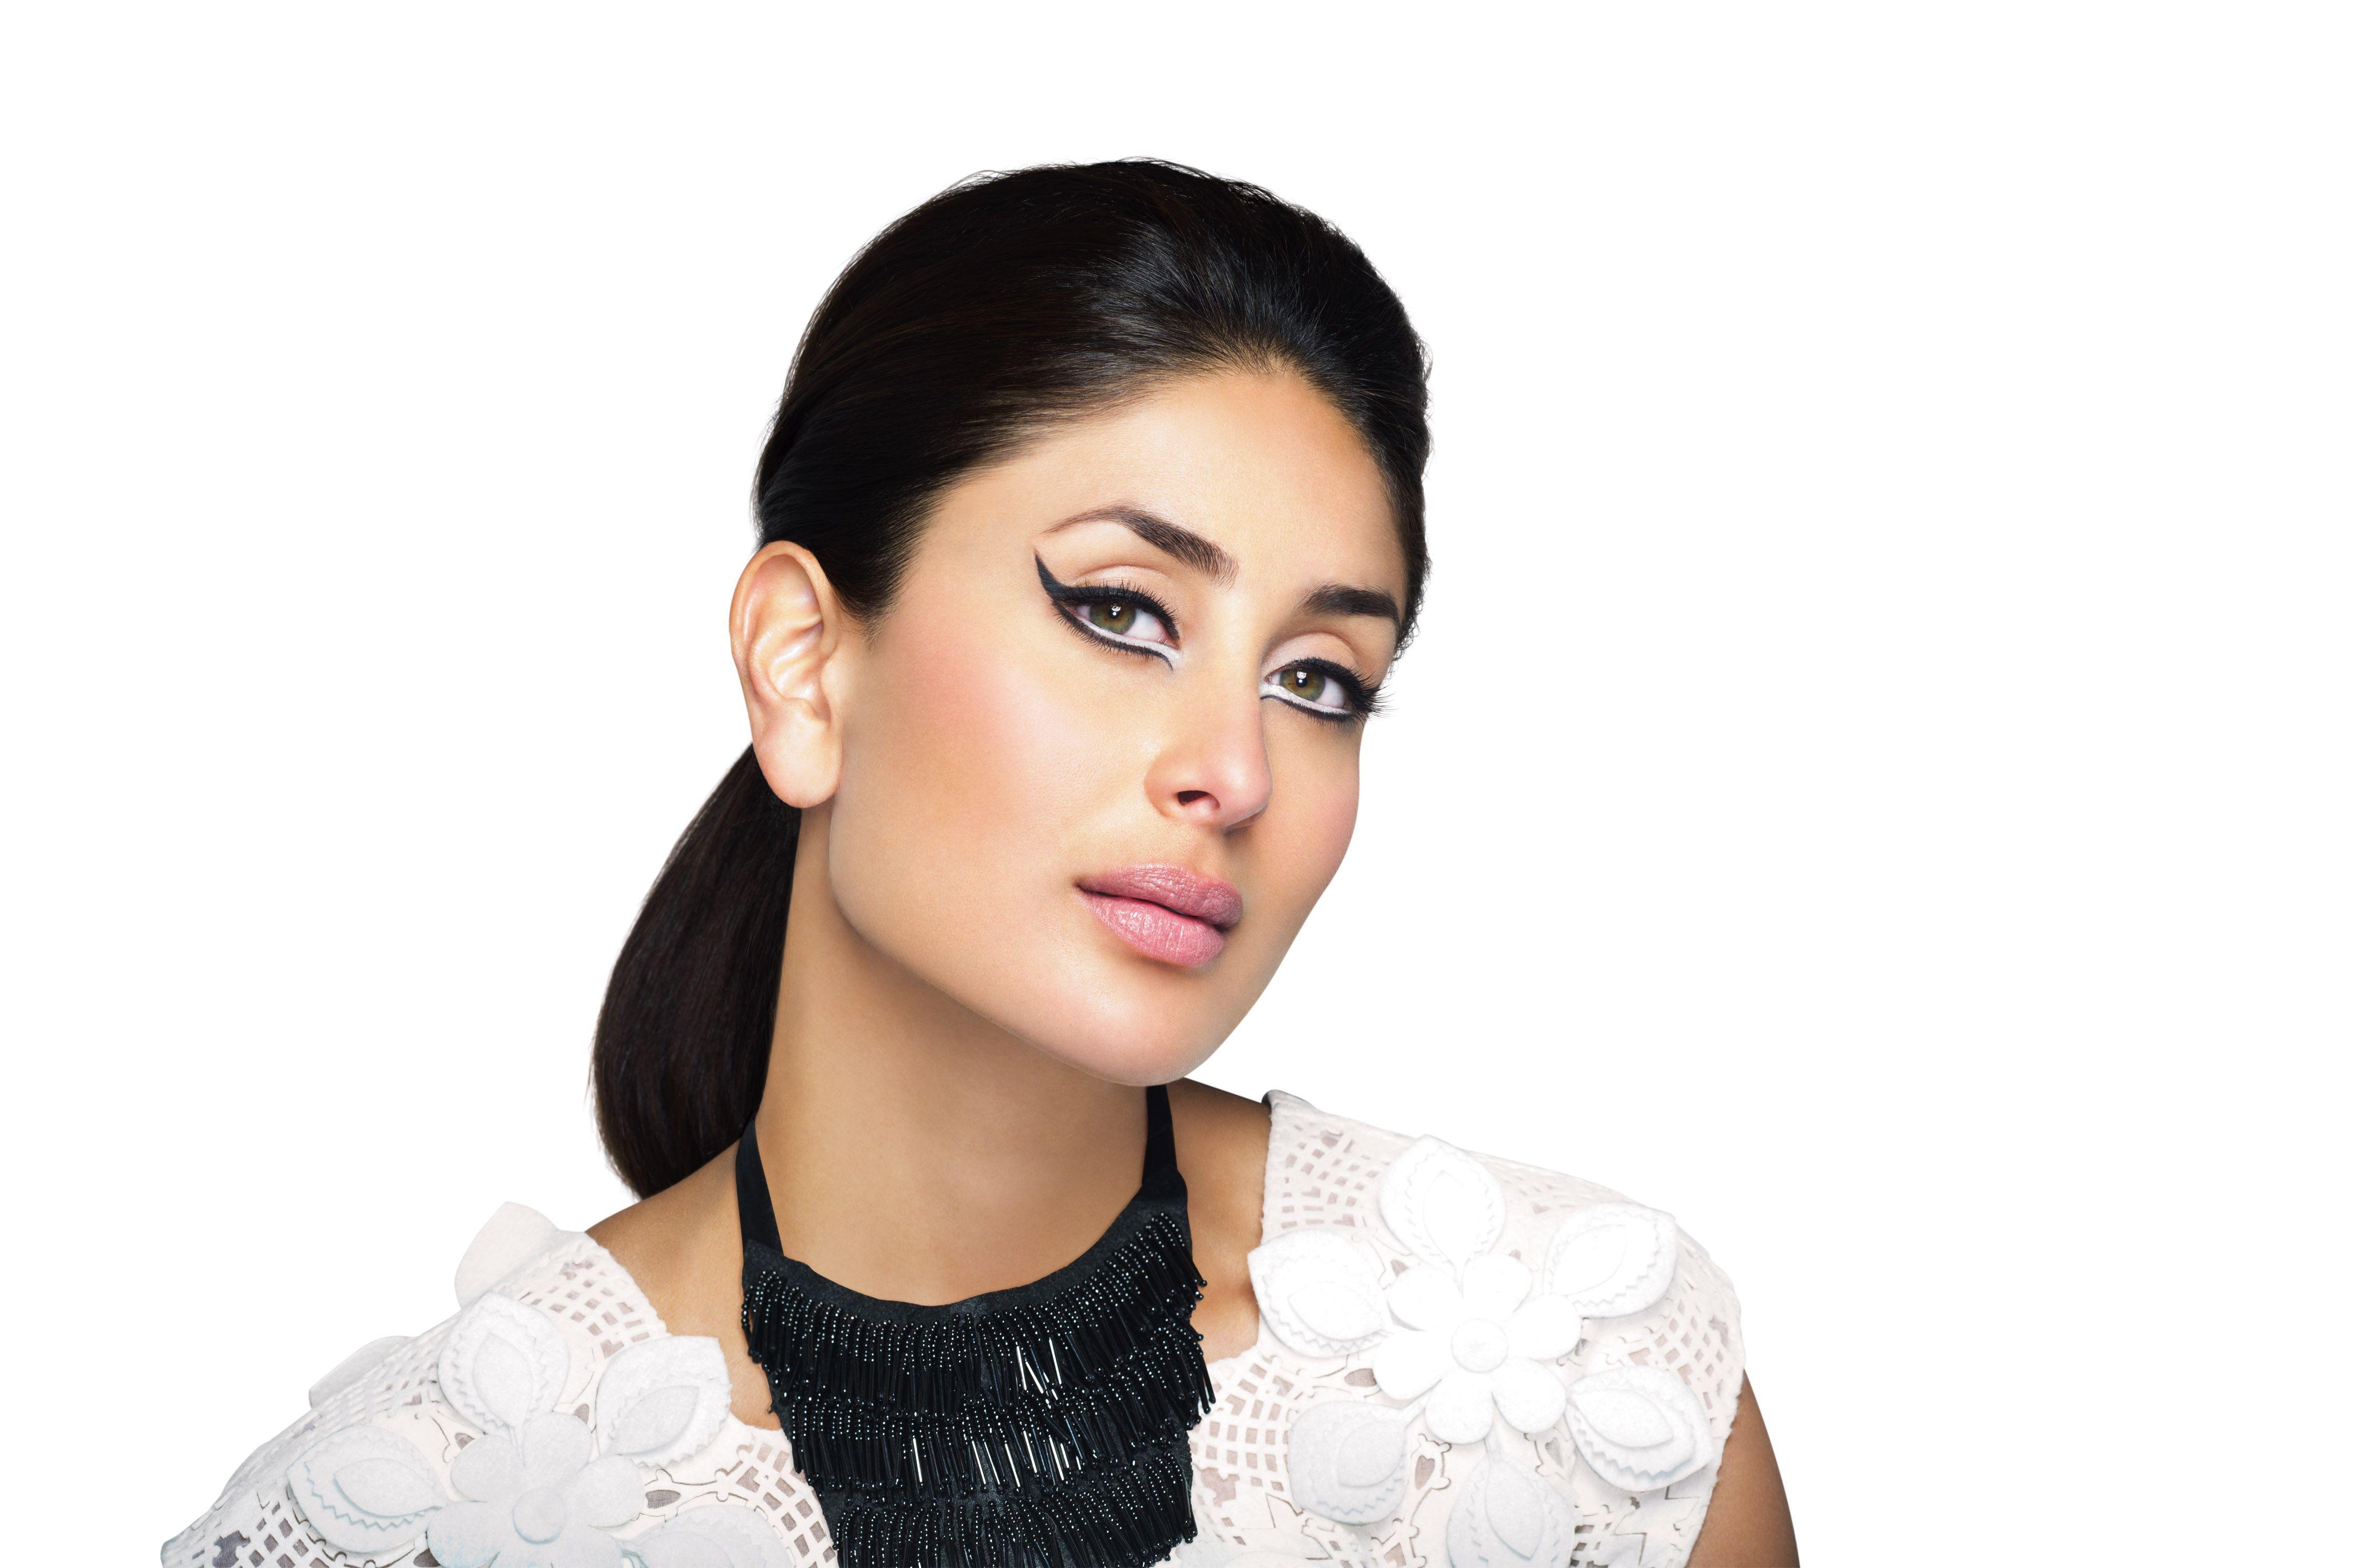 #Black #Lakme #Eyeconic #kajal #Classic #winged #makeup # ...